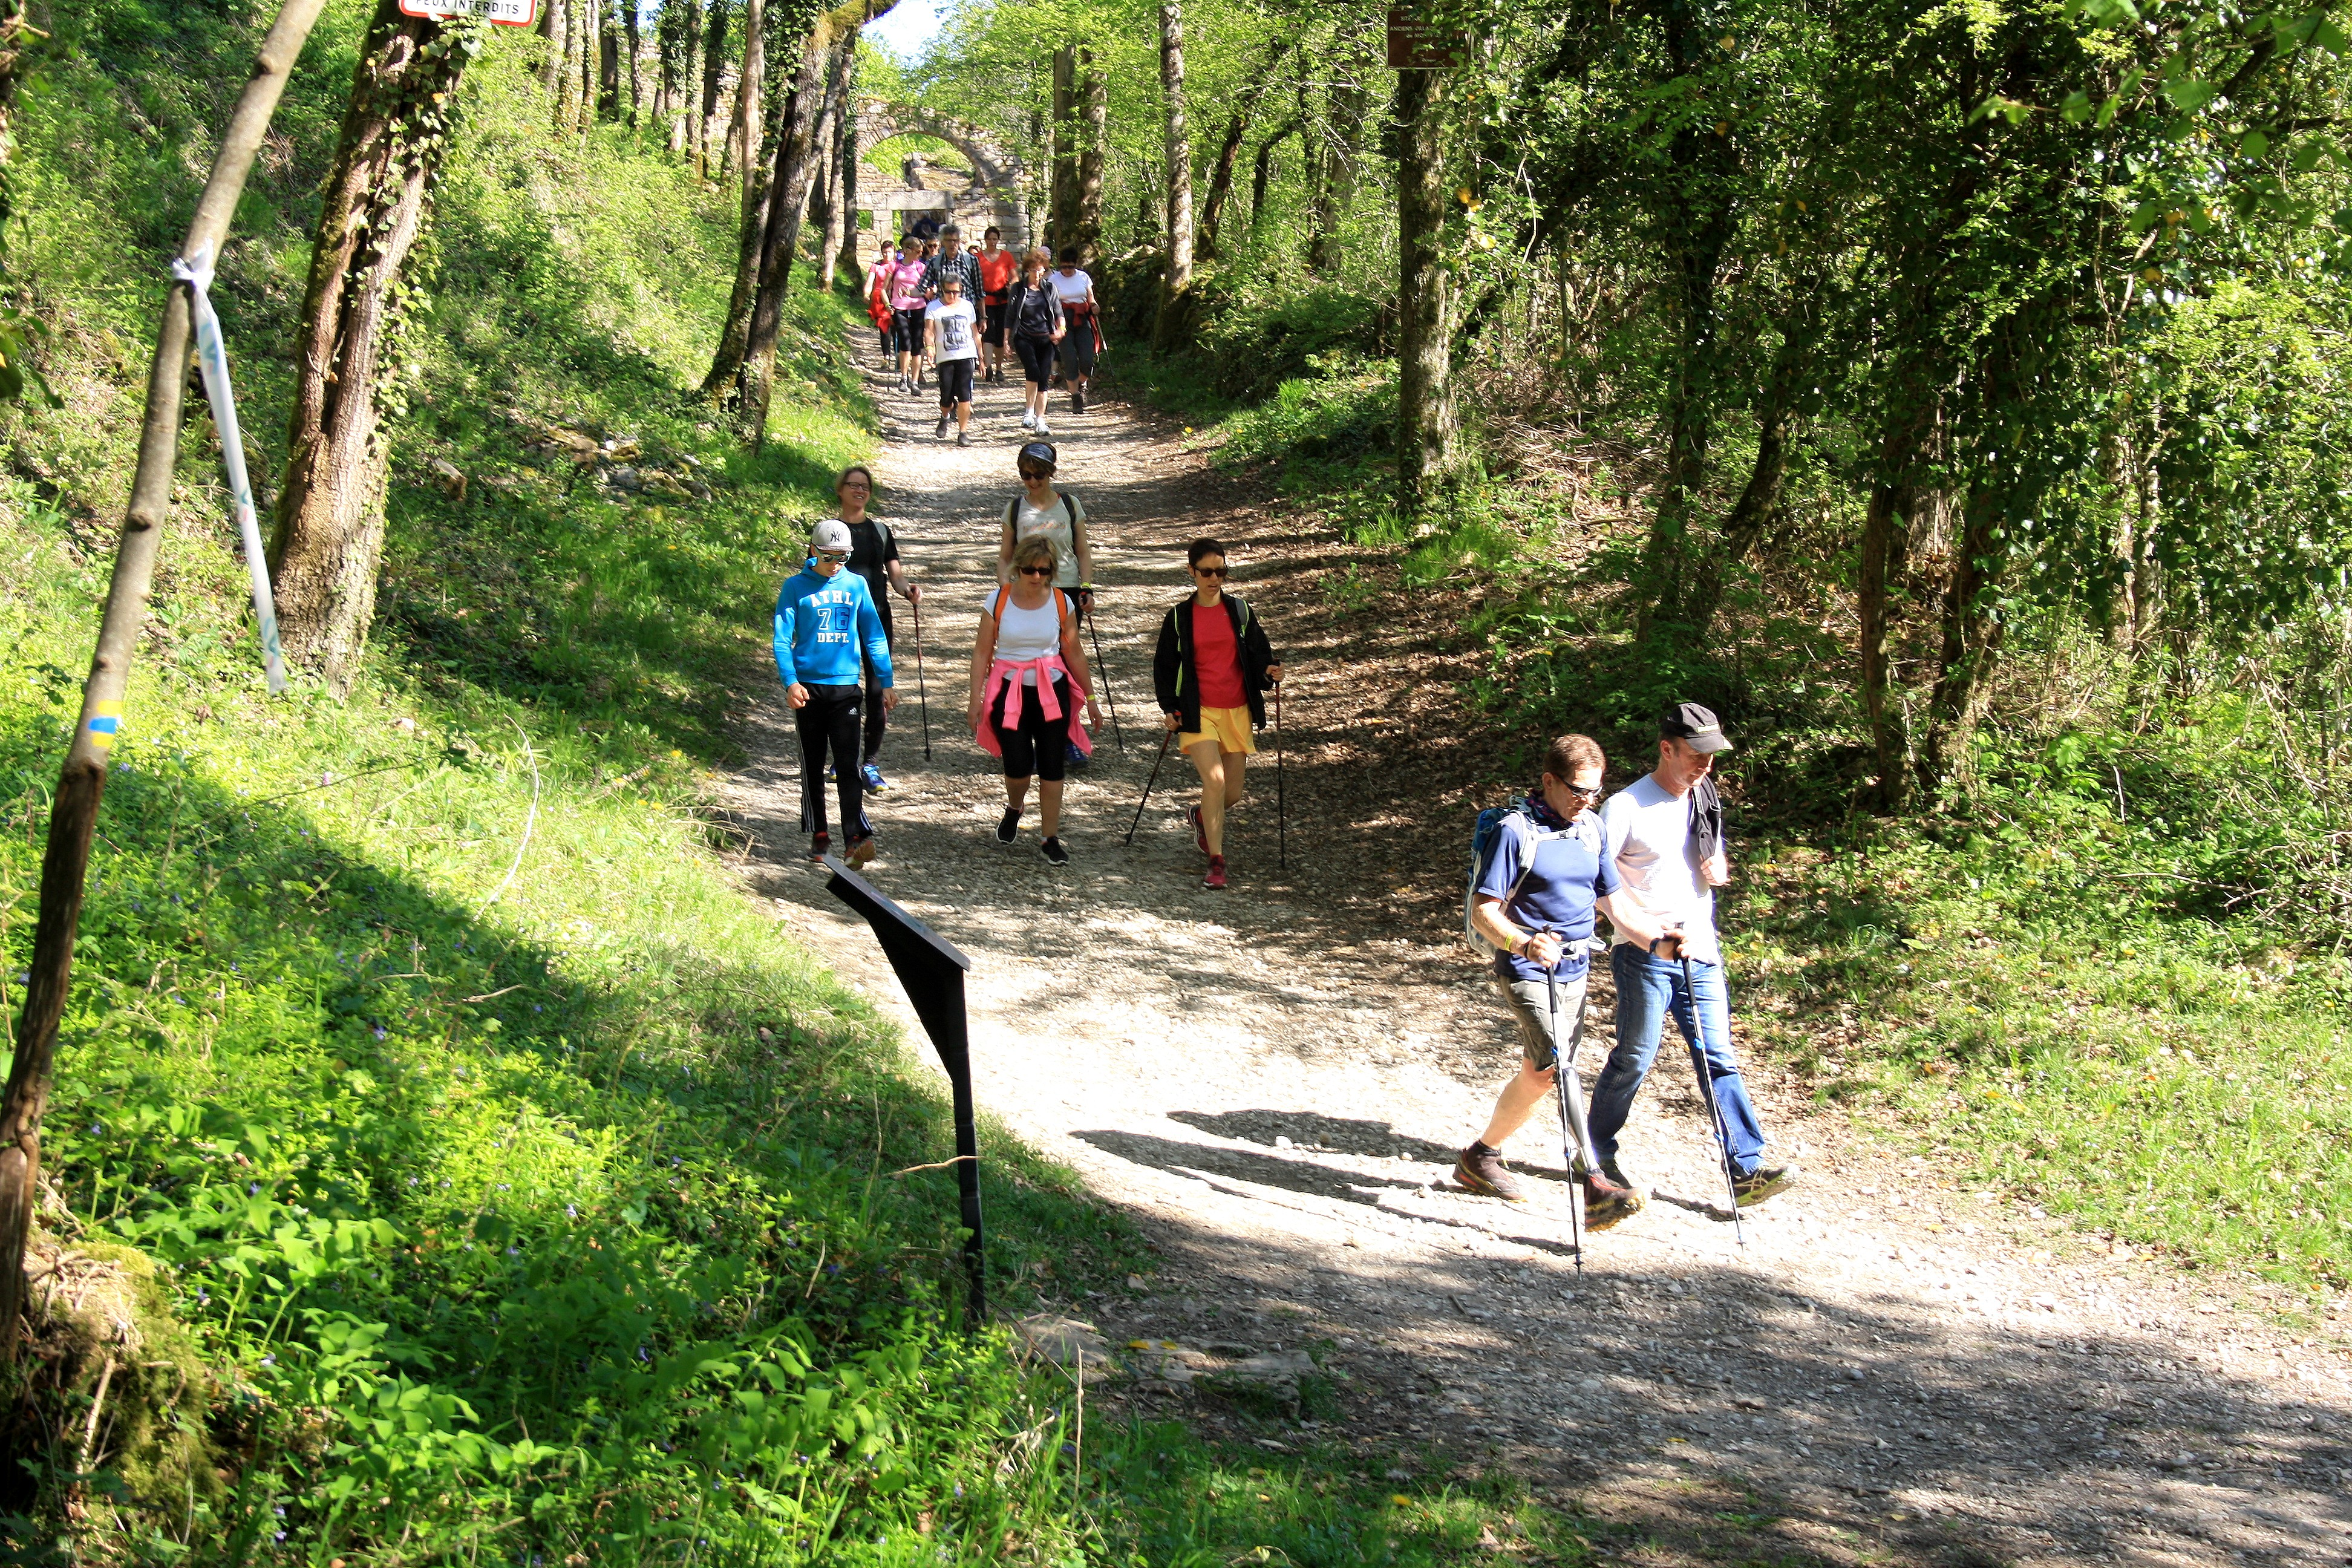 2017-04-09 - Trail-Montfaucon (245) - Copie